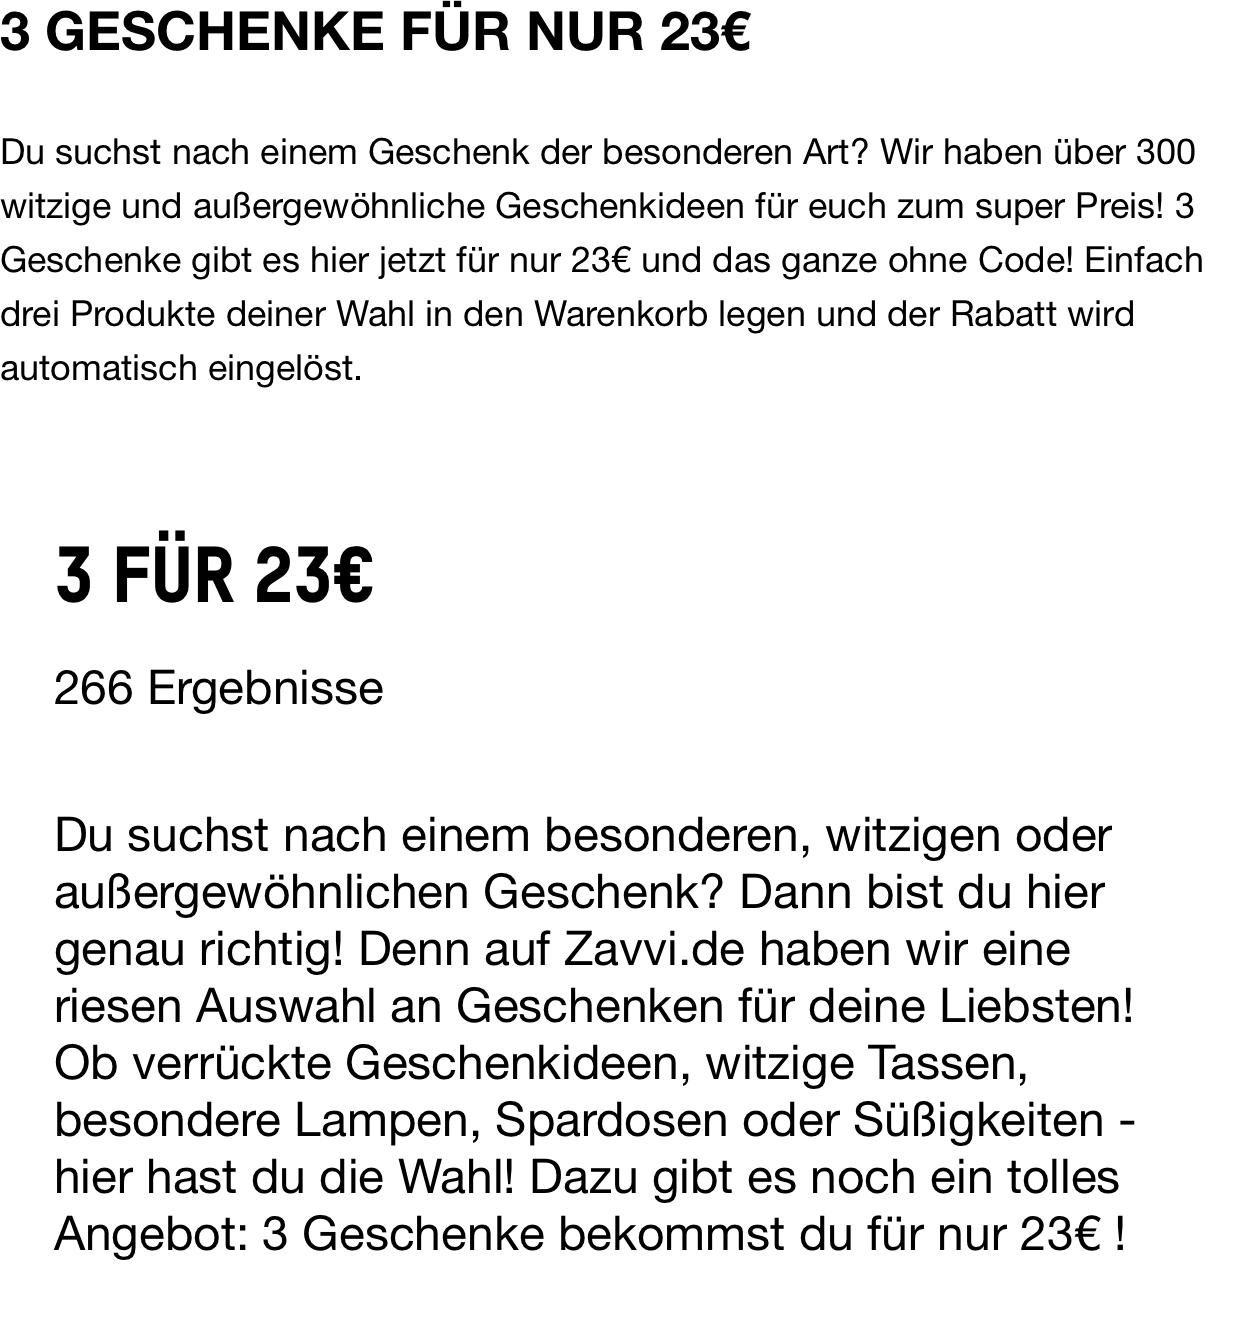 Zavi.de 3 Artikel für 23€